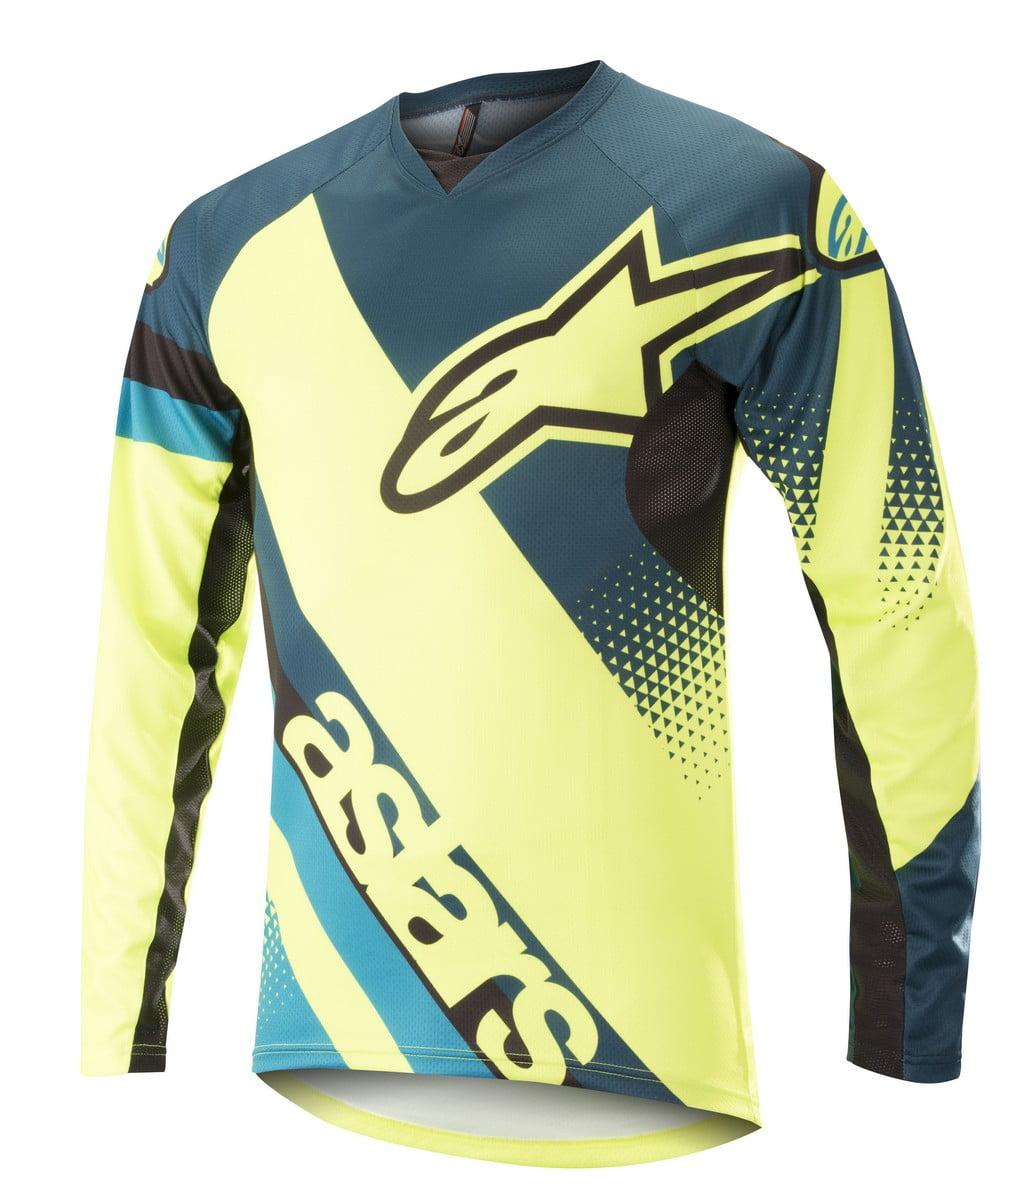 1767518_7075_RACER LS jersey_PetrolYellow